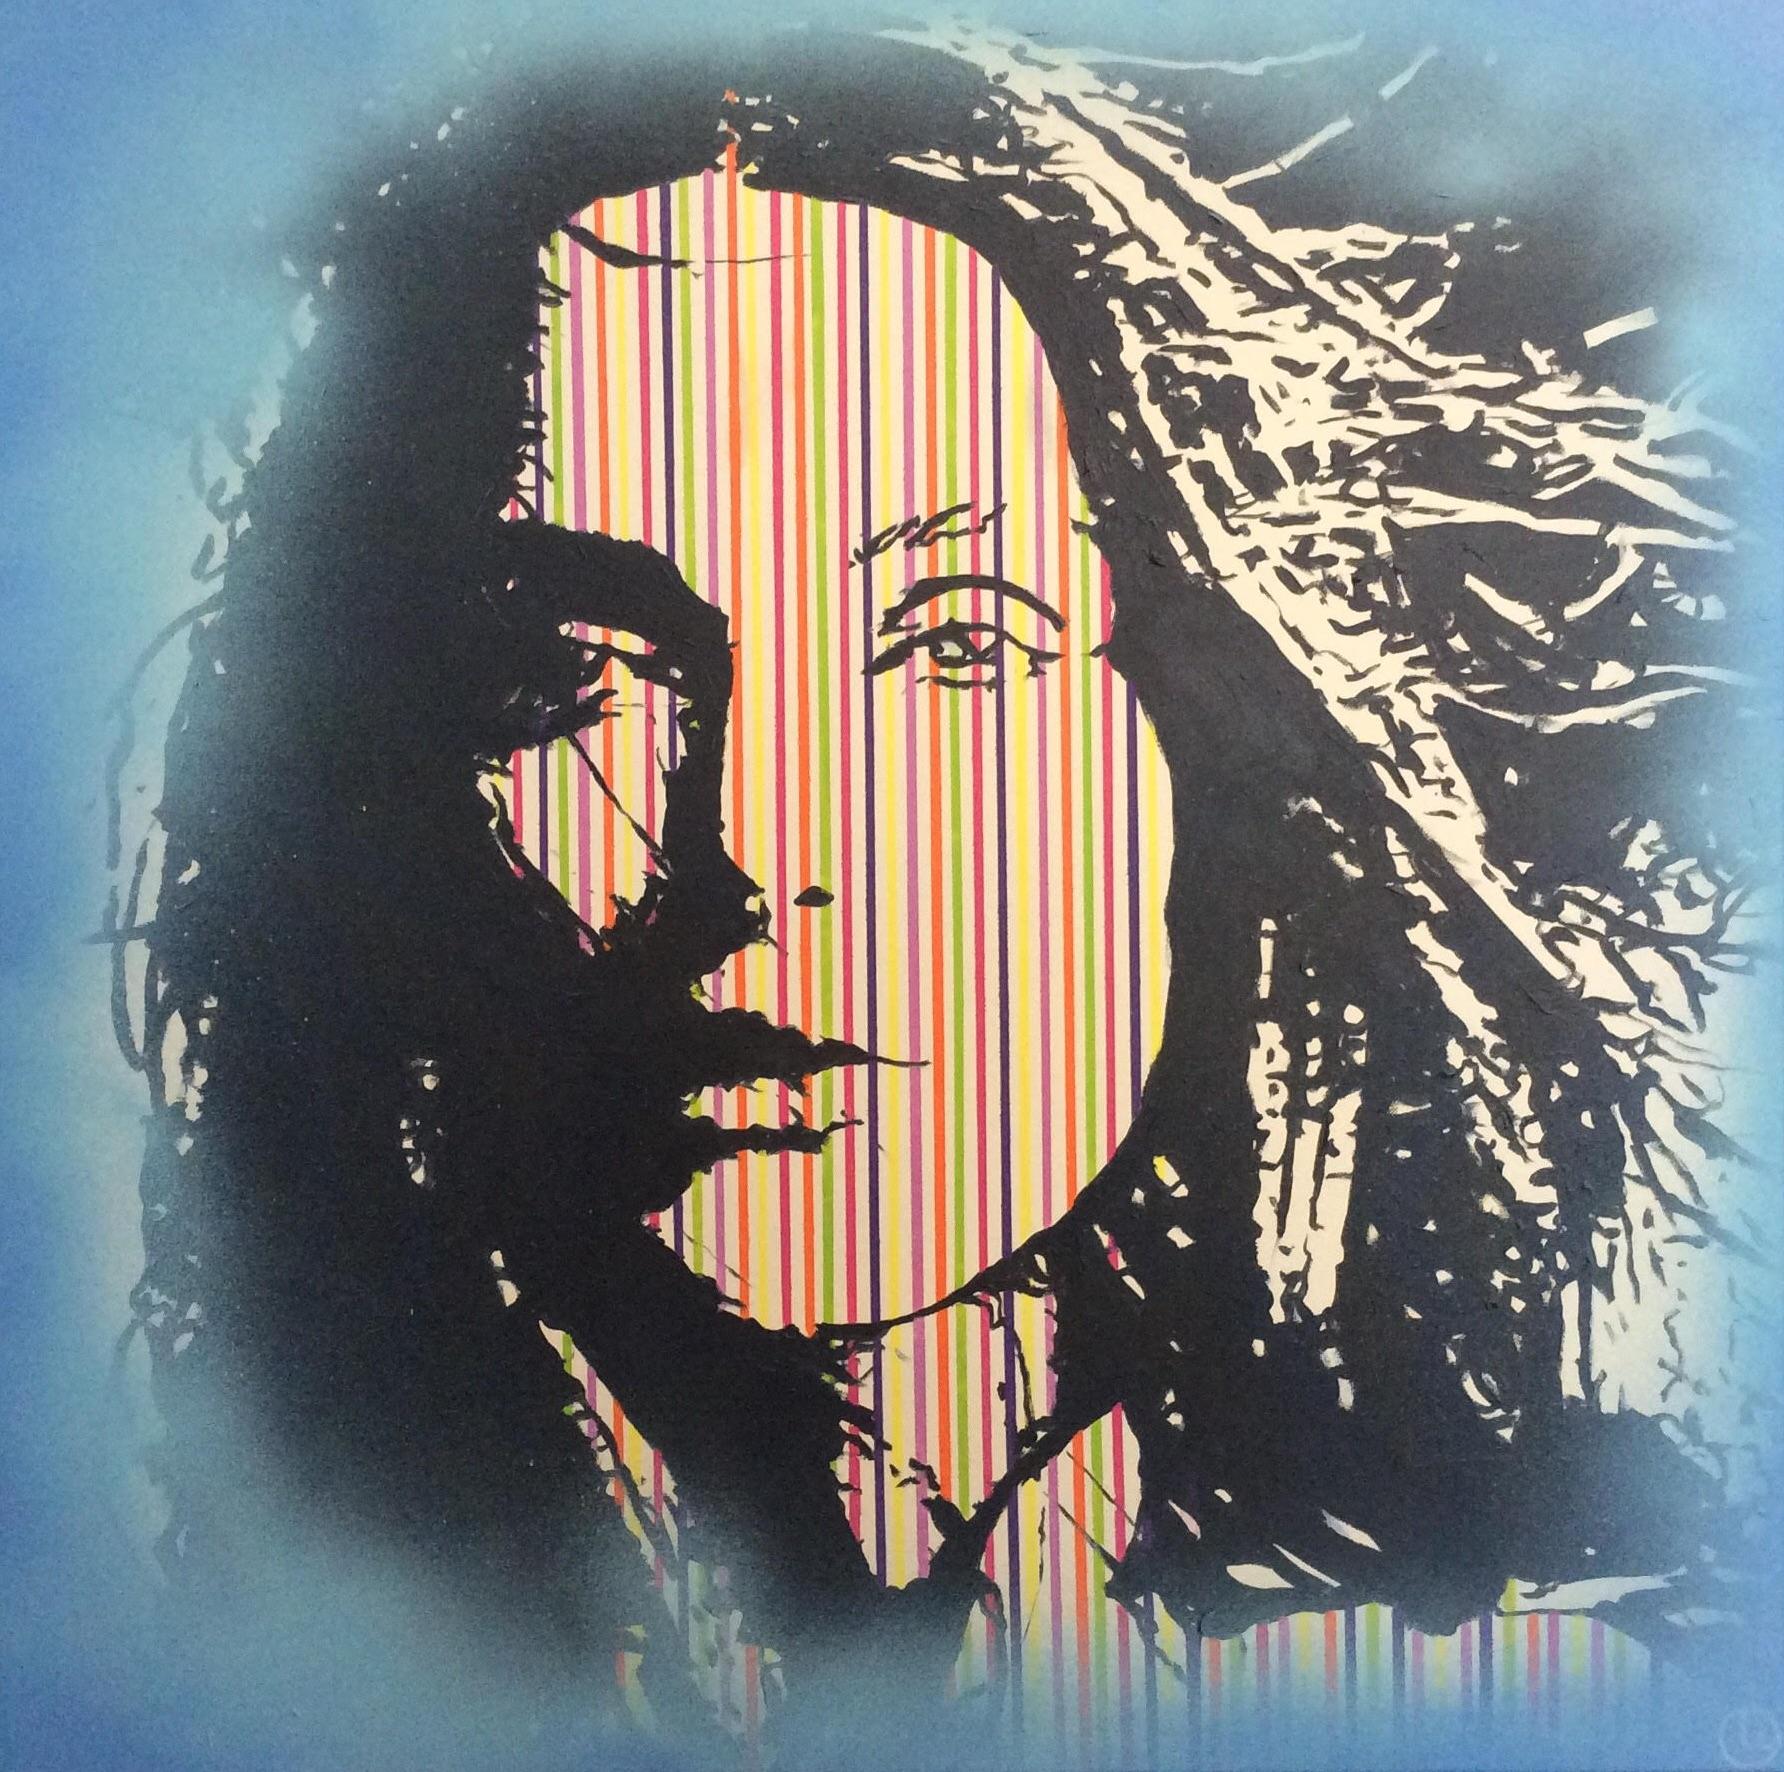 olivier ameye belgium painter acrylic tv for sale